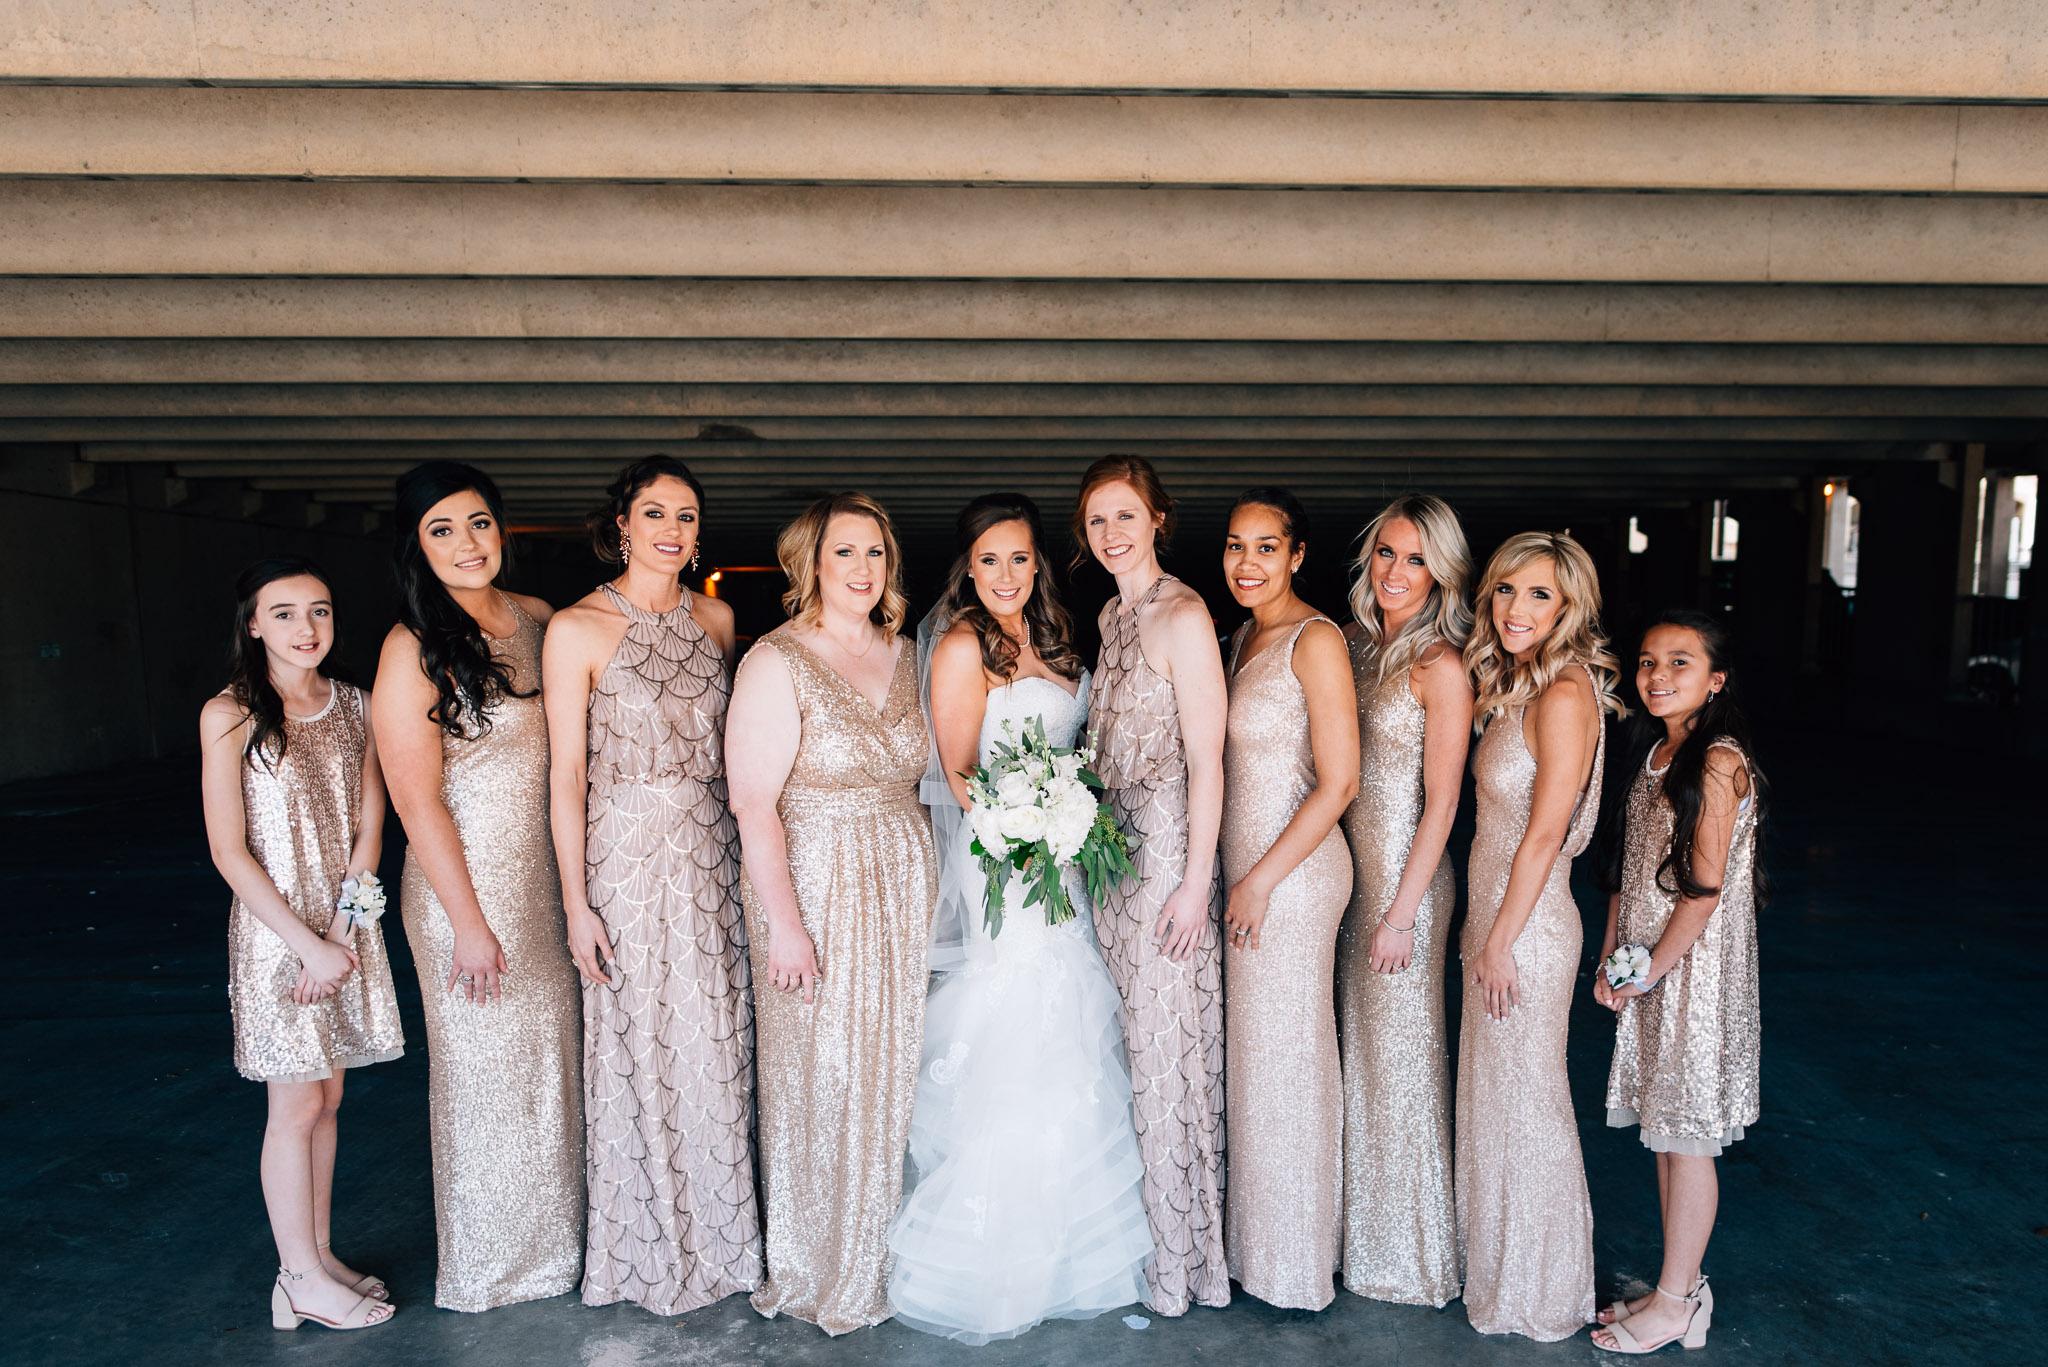 Cactus-Hotel-Wedding-San-Angelo-0011.jpg